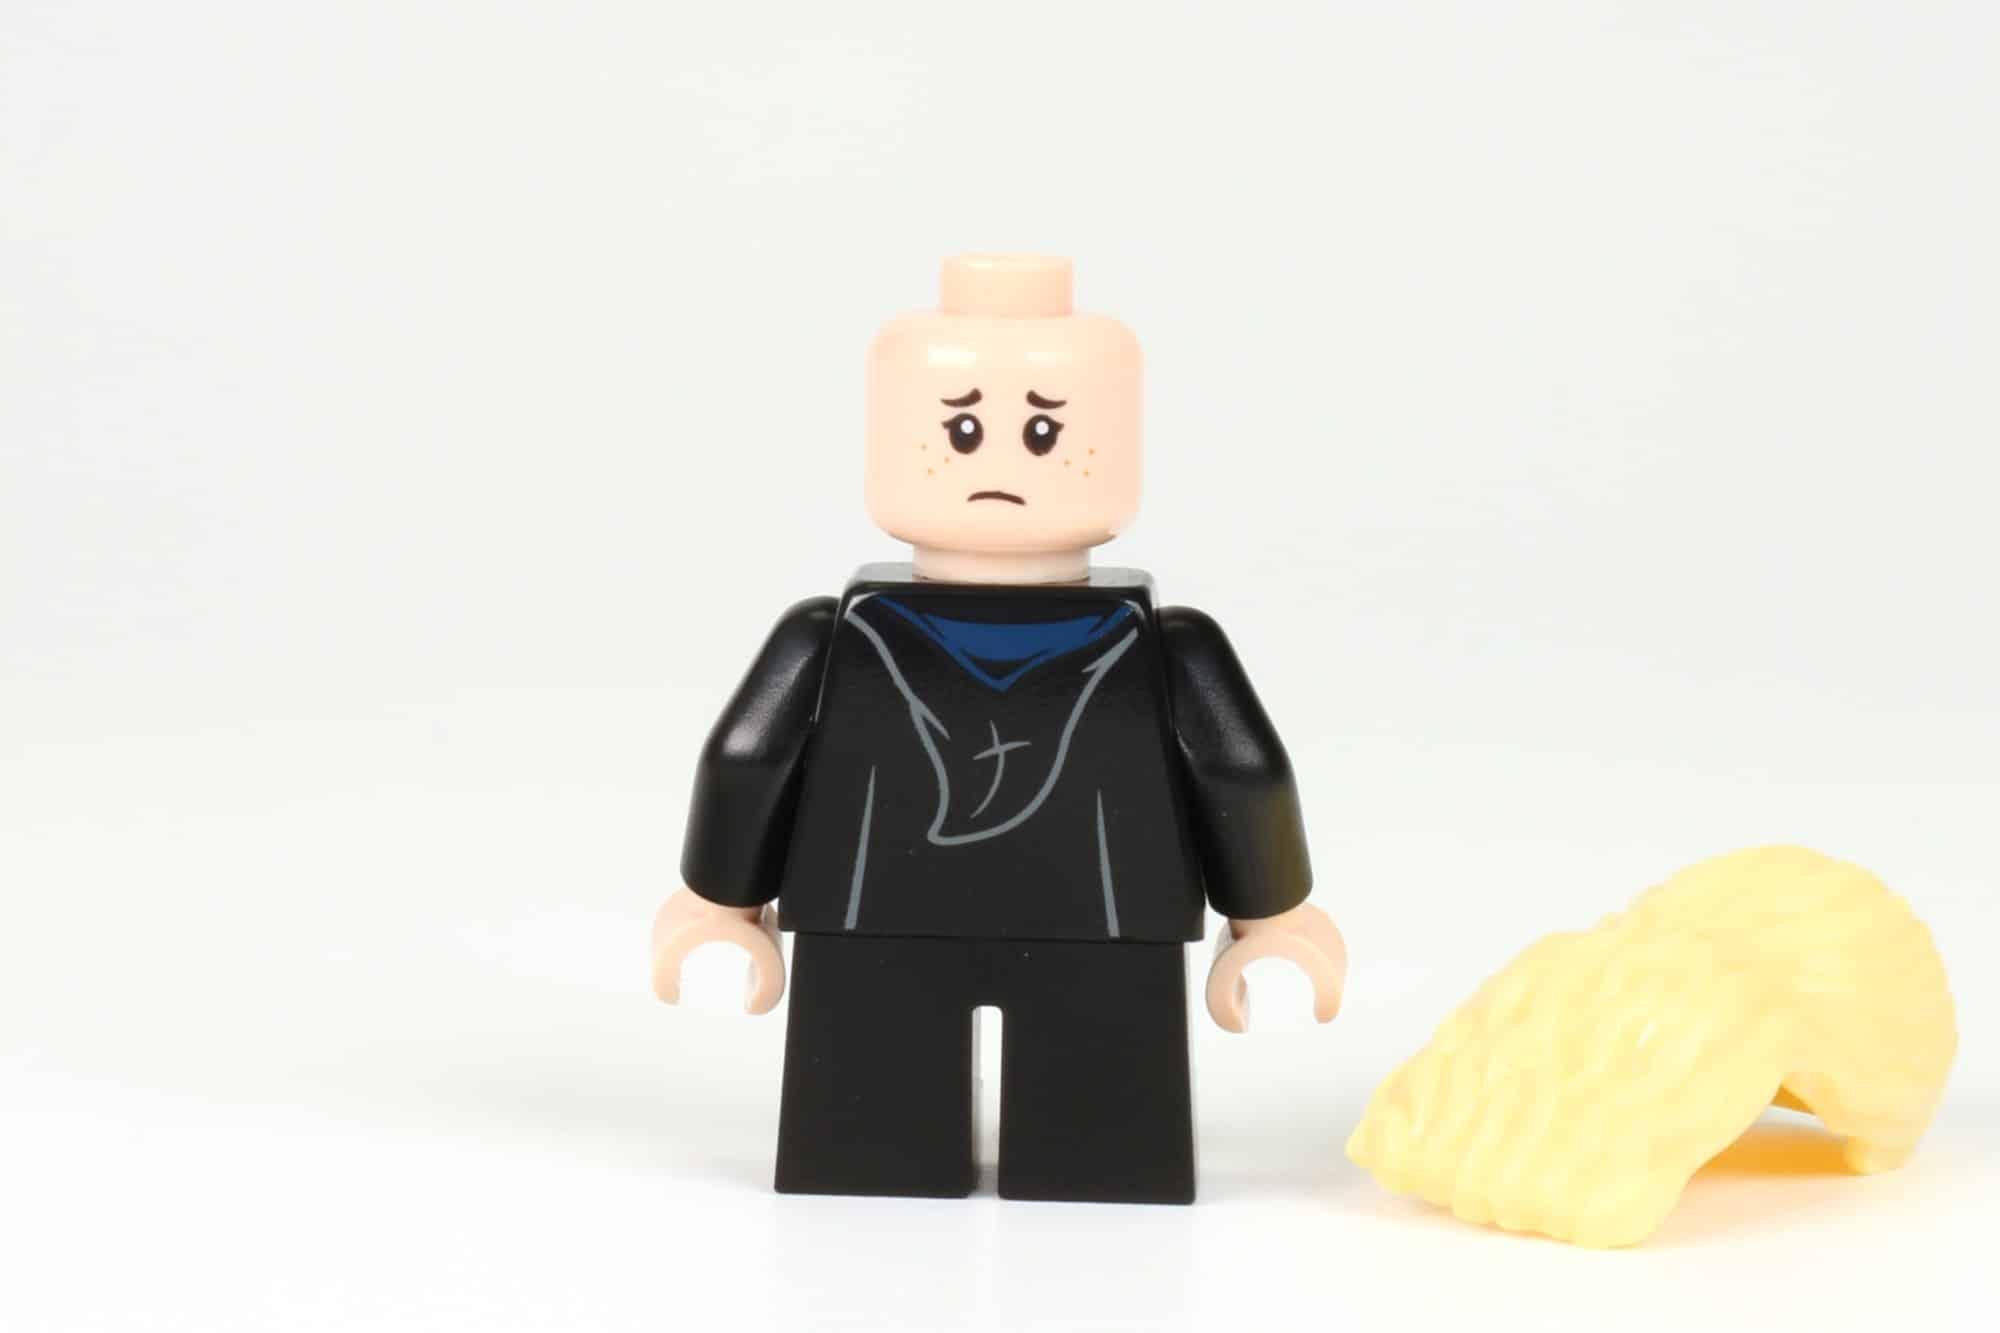 LEGO Harry Potter 76389 Hogwarts Kammer Des Schreckens Minifiguren 9 2